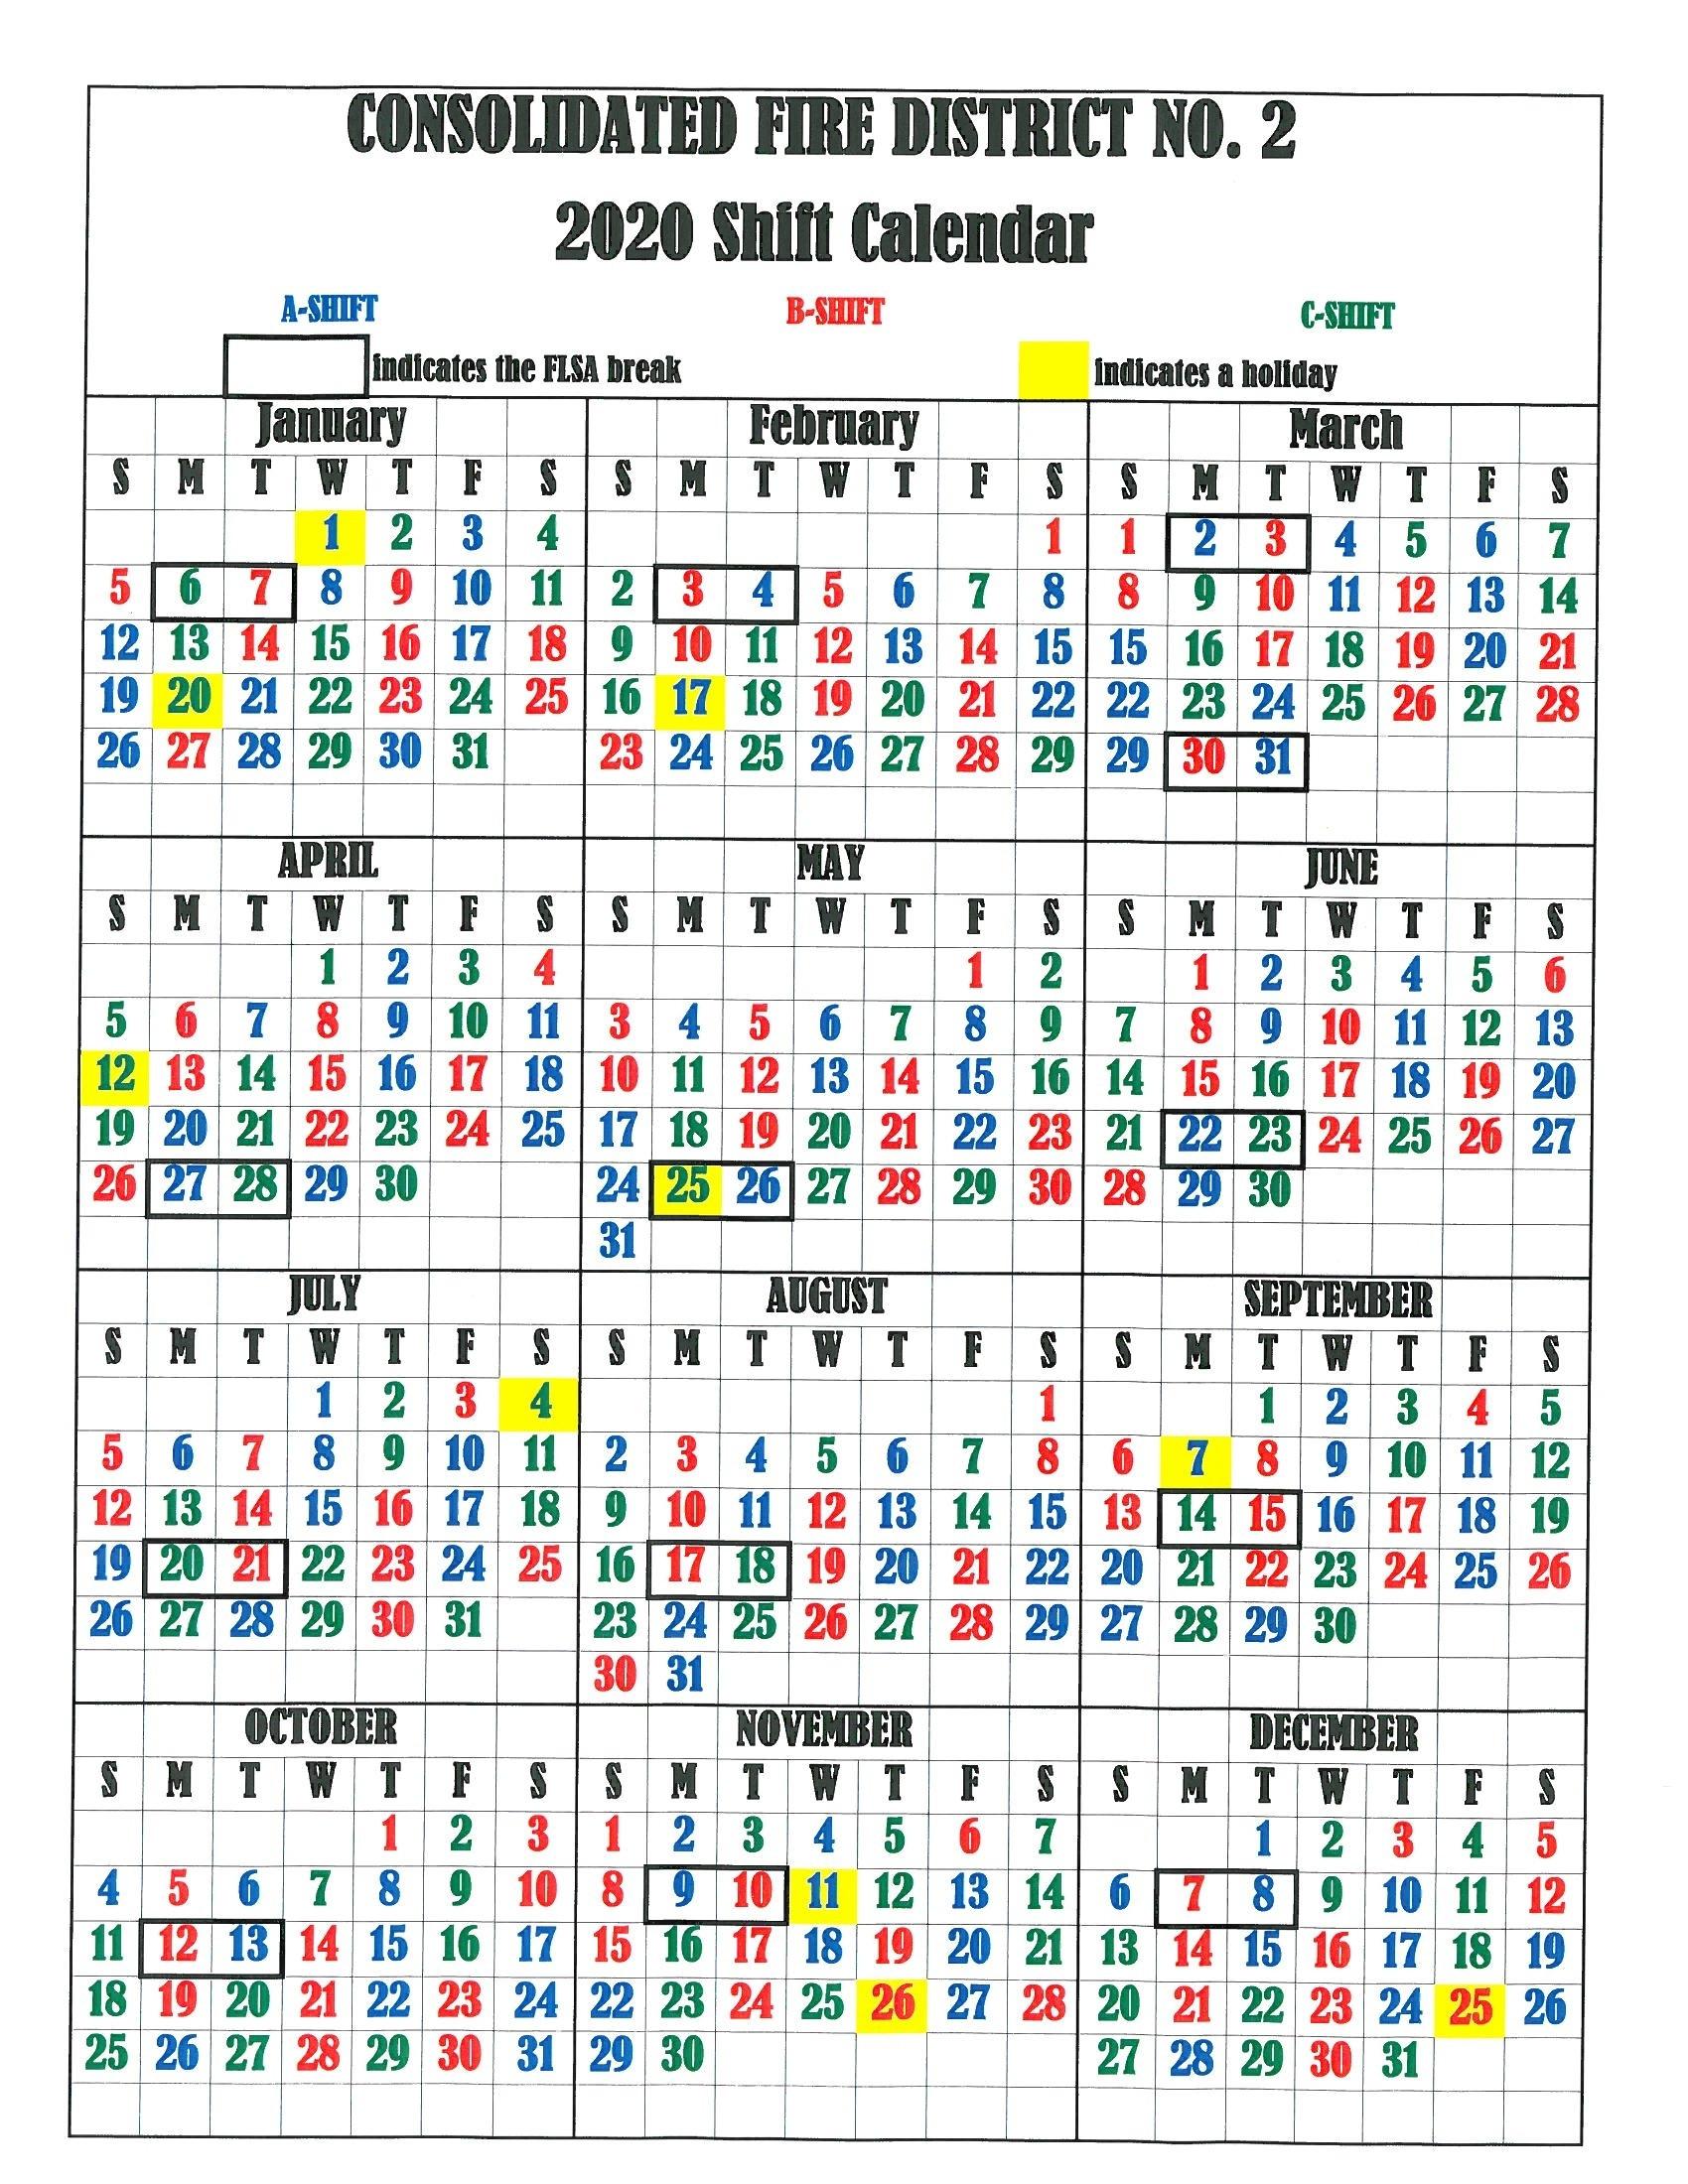 2020 Dupont Shift Schedule | Avnitasoni-Shift Schedule Template 2021